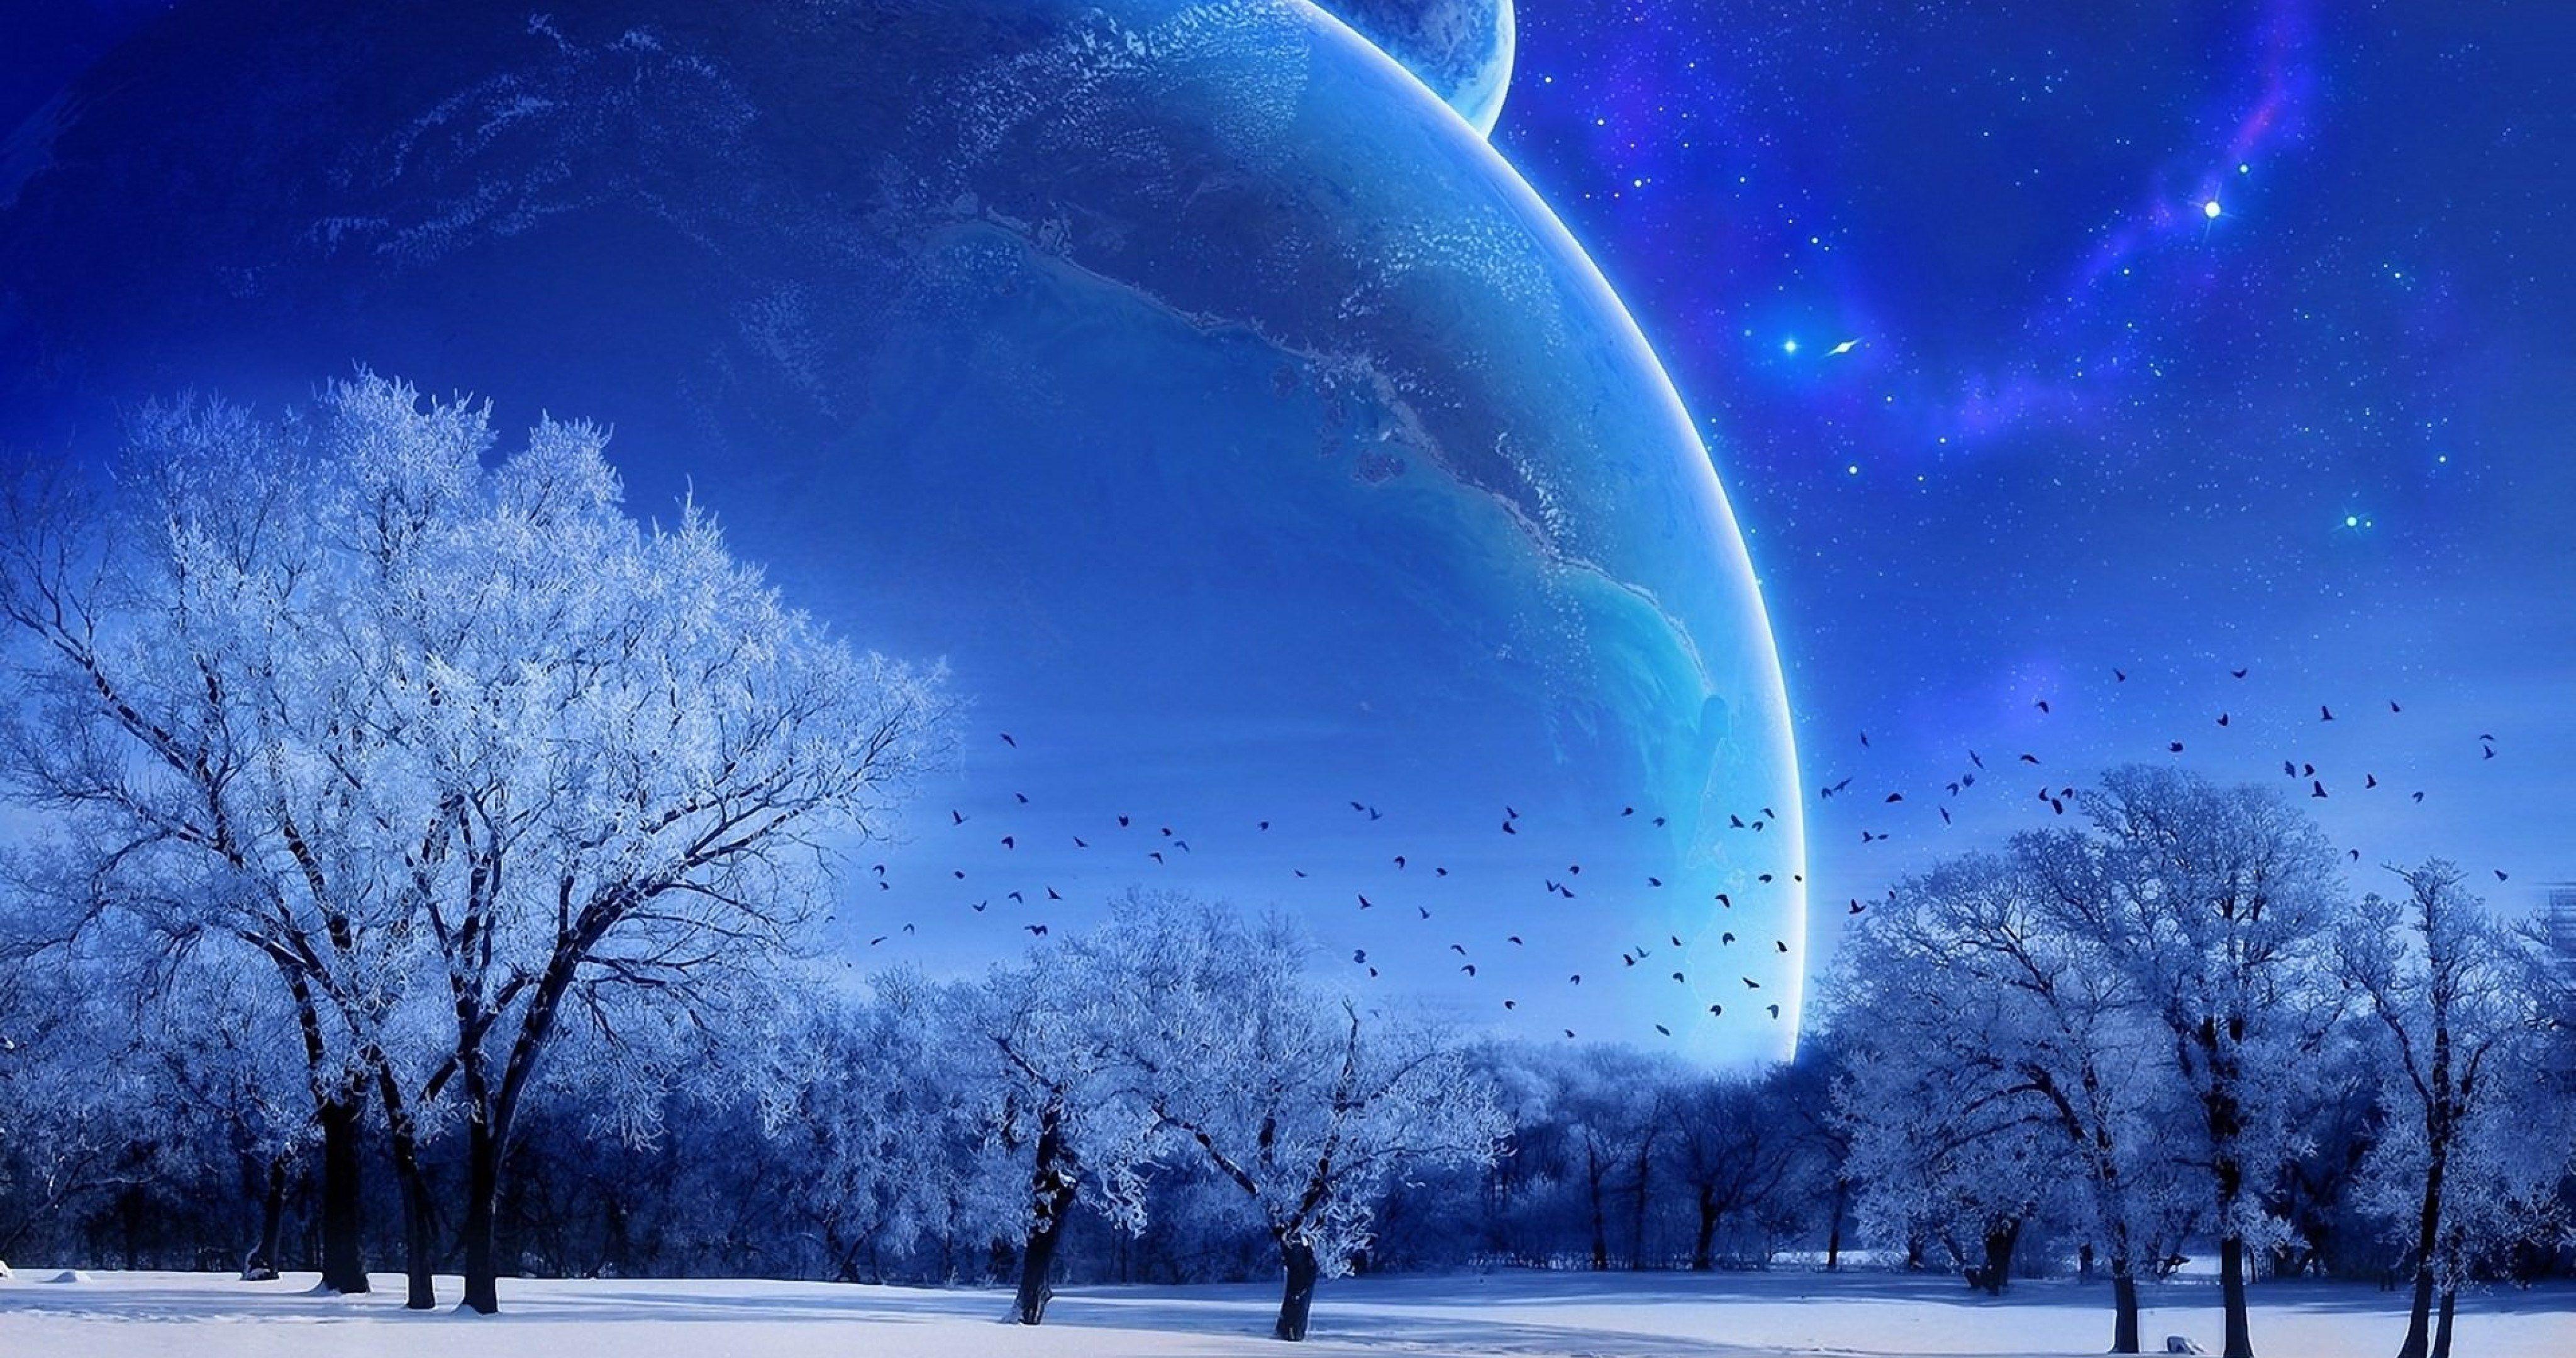 blue moon nature 4k ultra hd wallpaper wallpaper